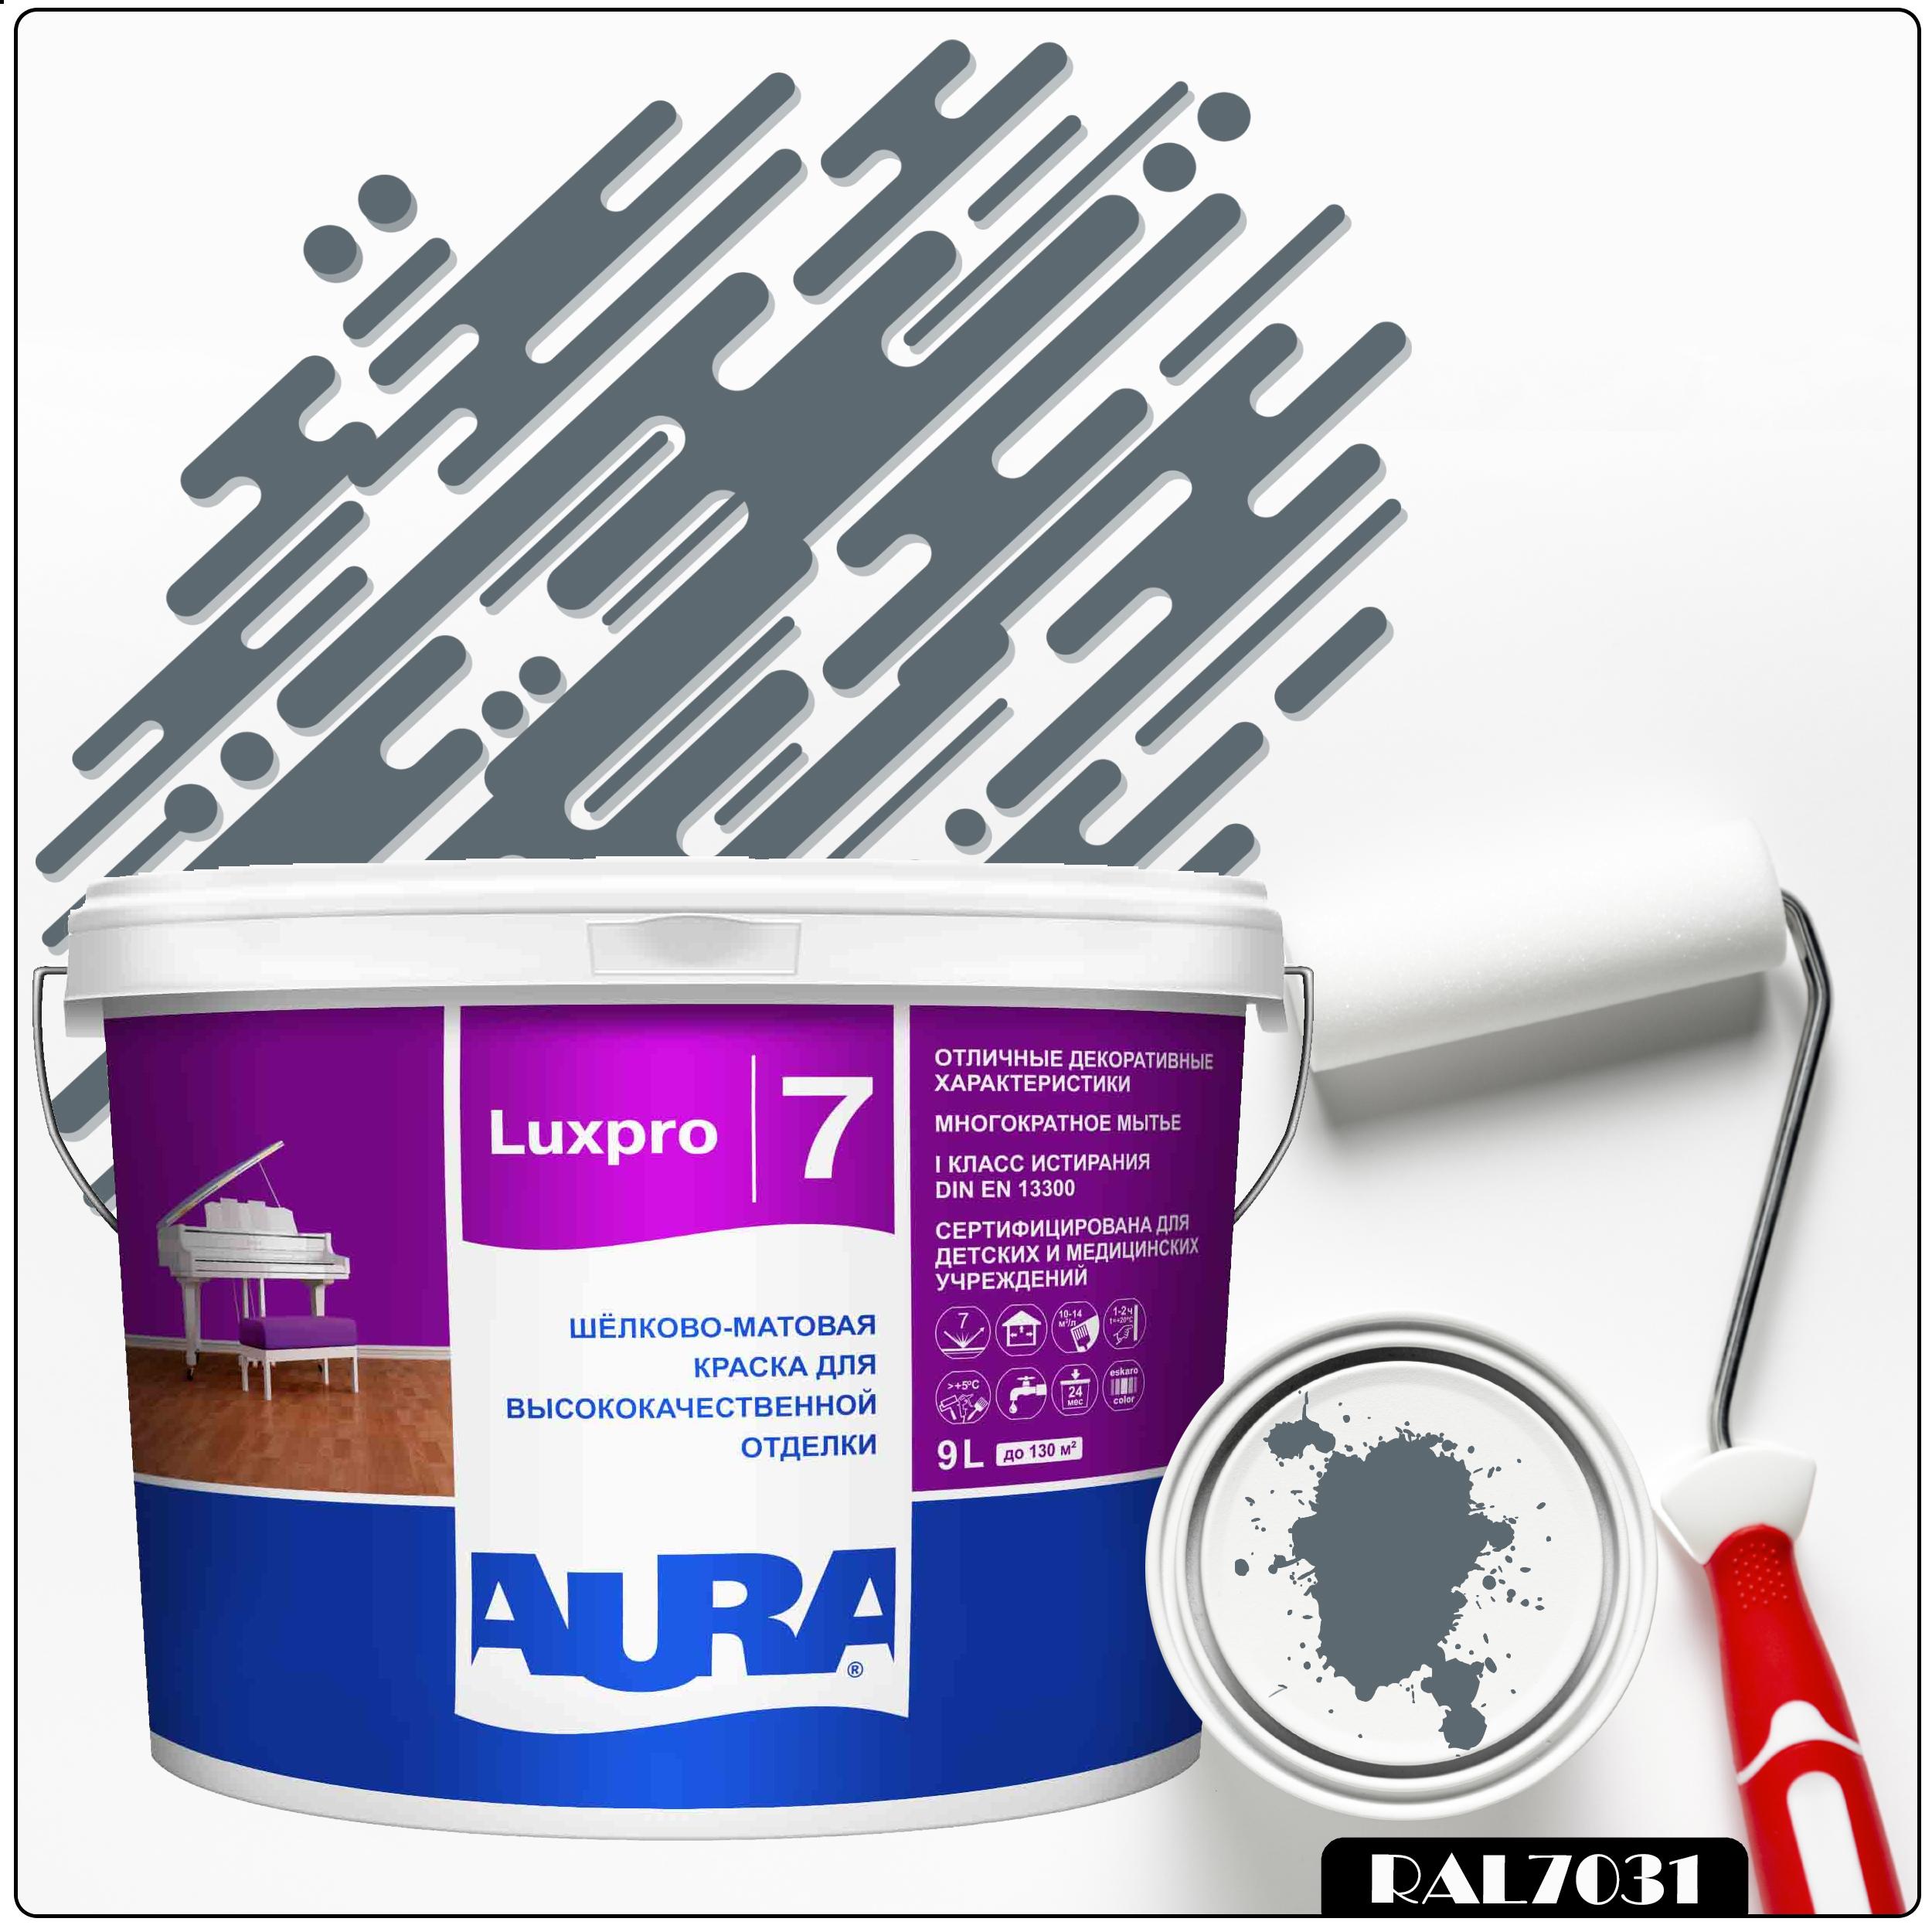 Фото 22 - Краска Aura LuxPRO 7, RAL 7031 Сине-серый, латексная, шелково-матовая, интерьерная, 9л, Аура.